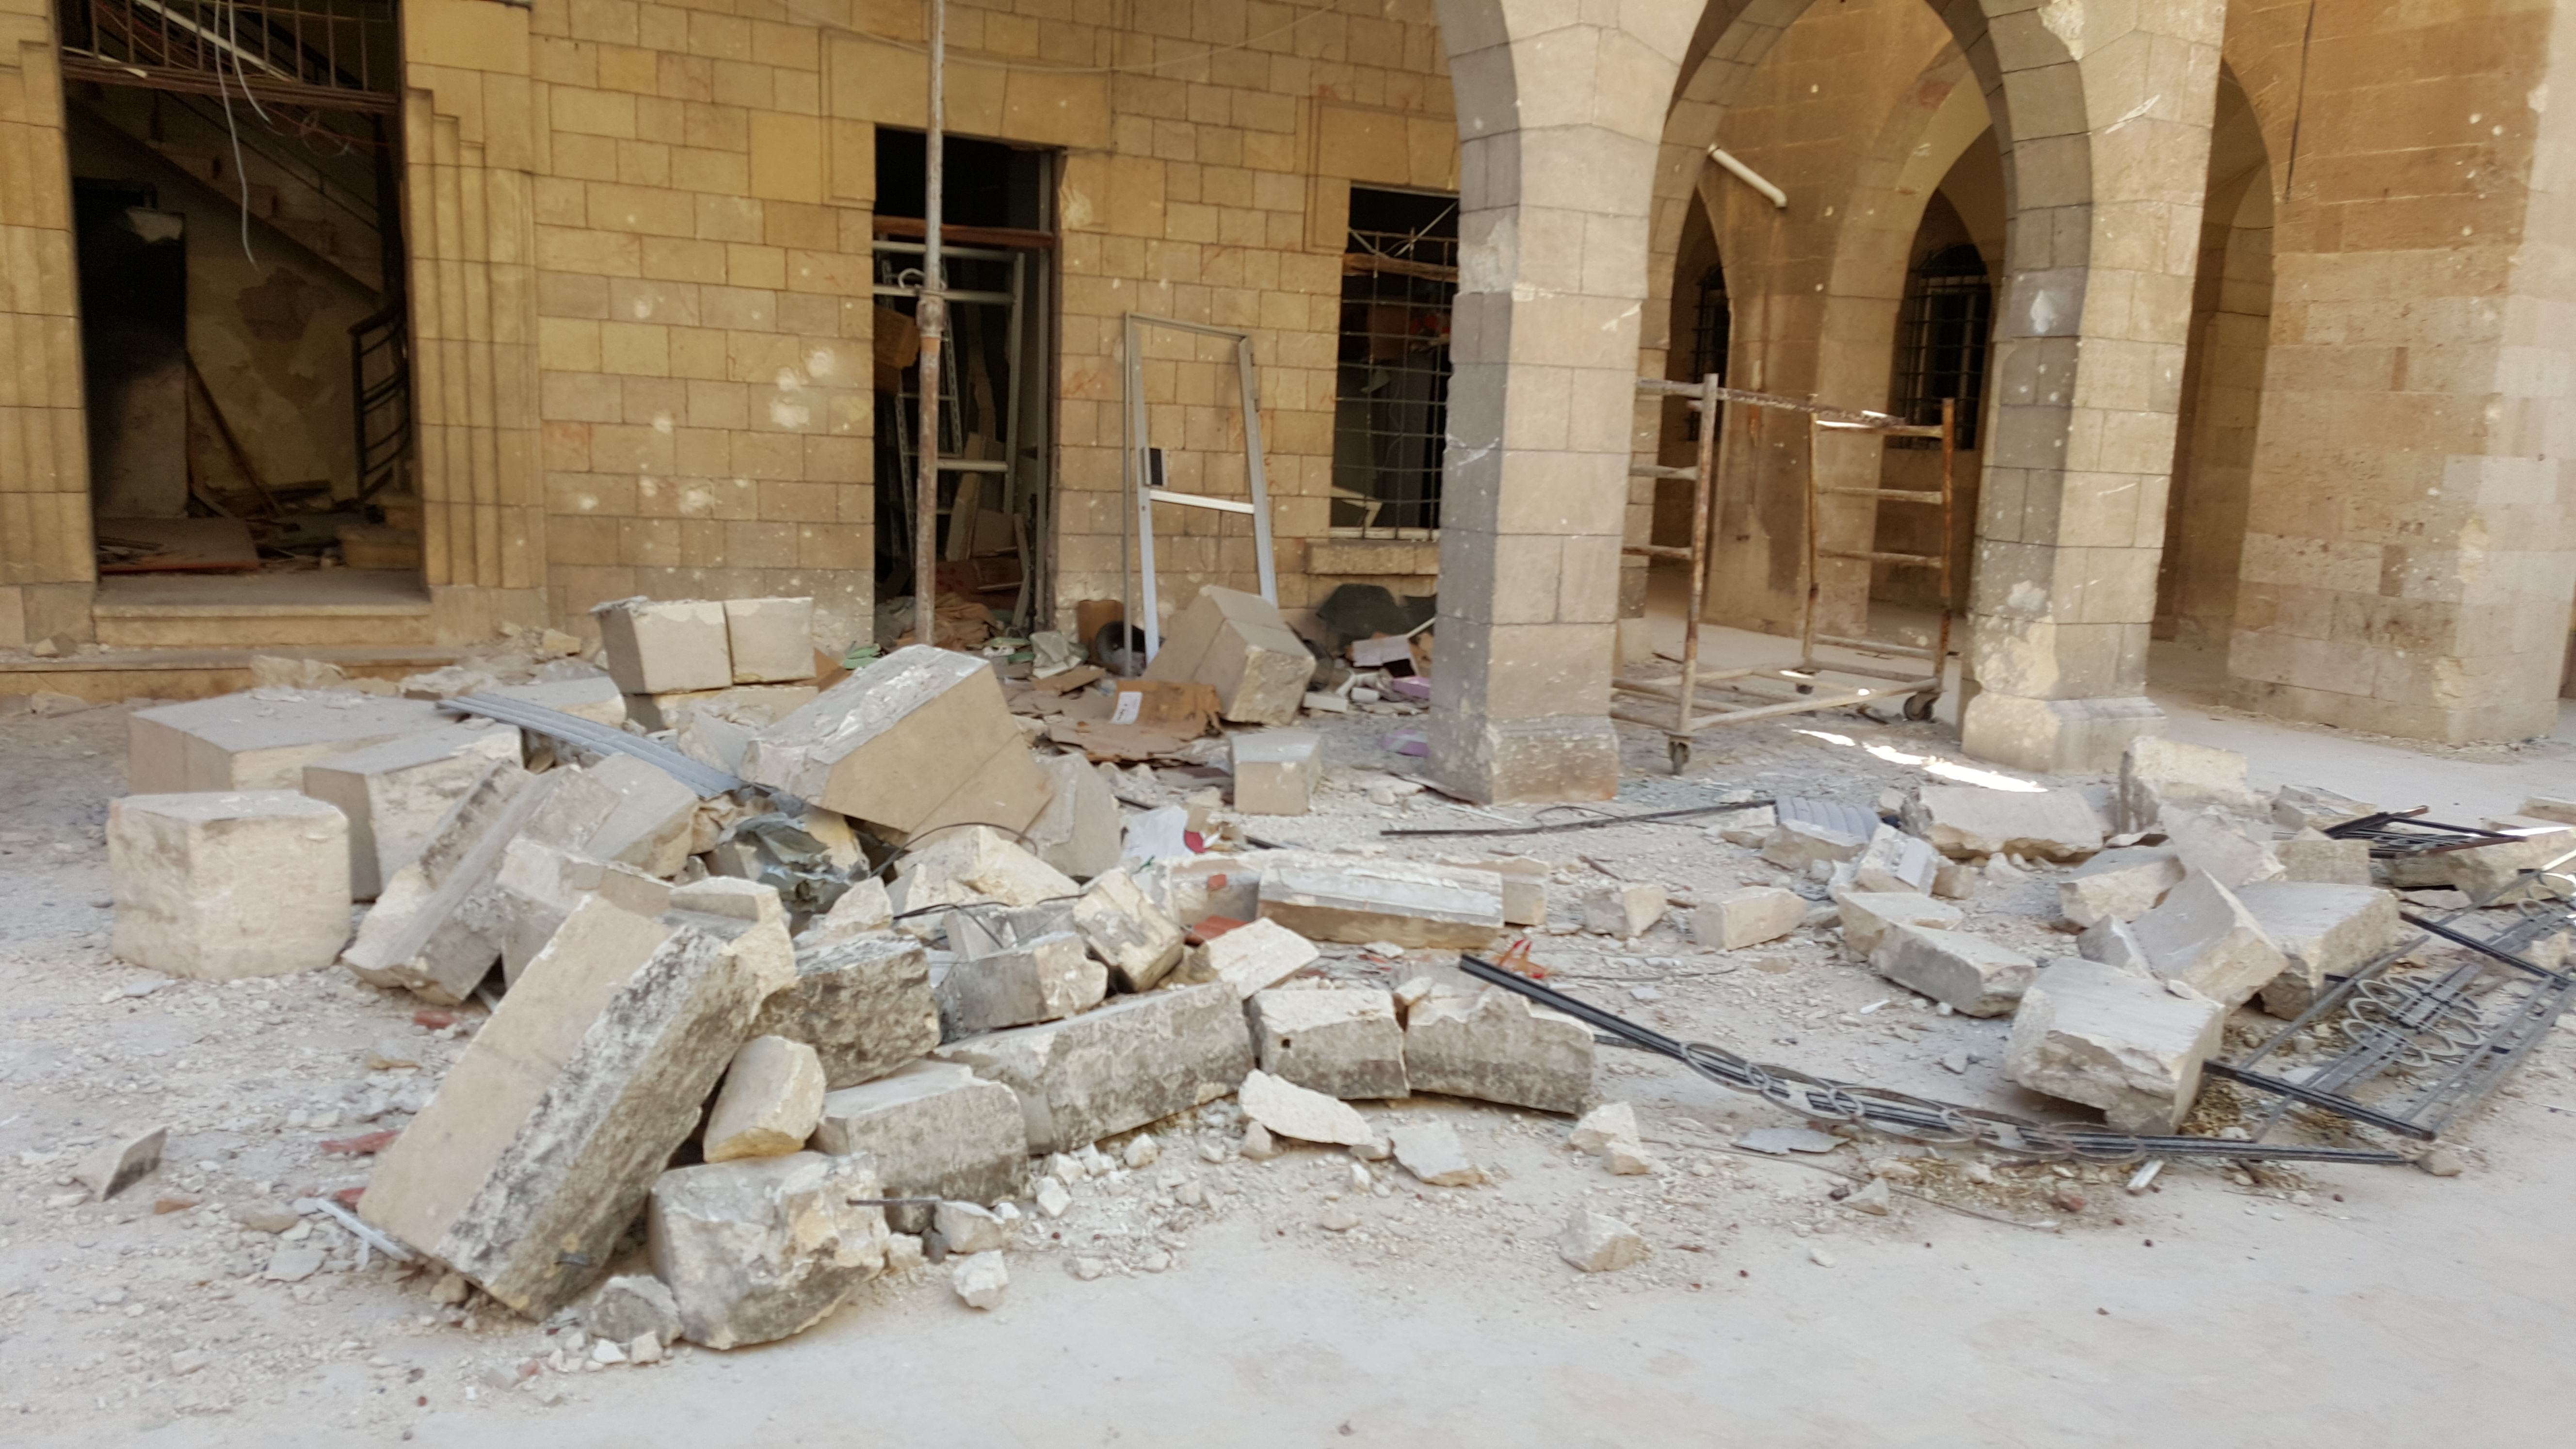 Destruction in Aleppo_Jeanbart - ACN Photo